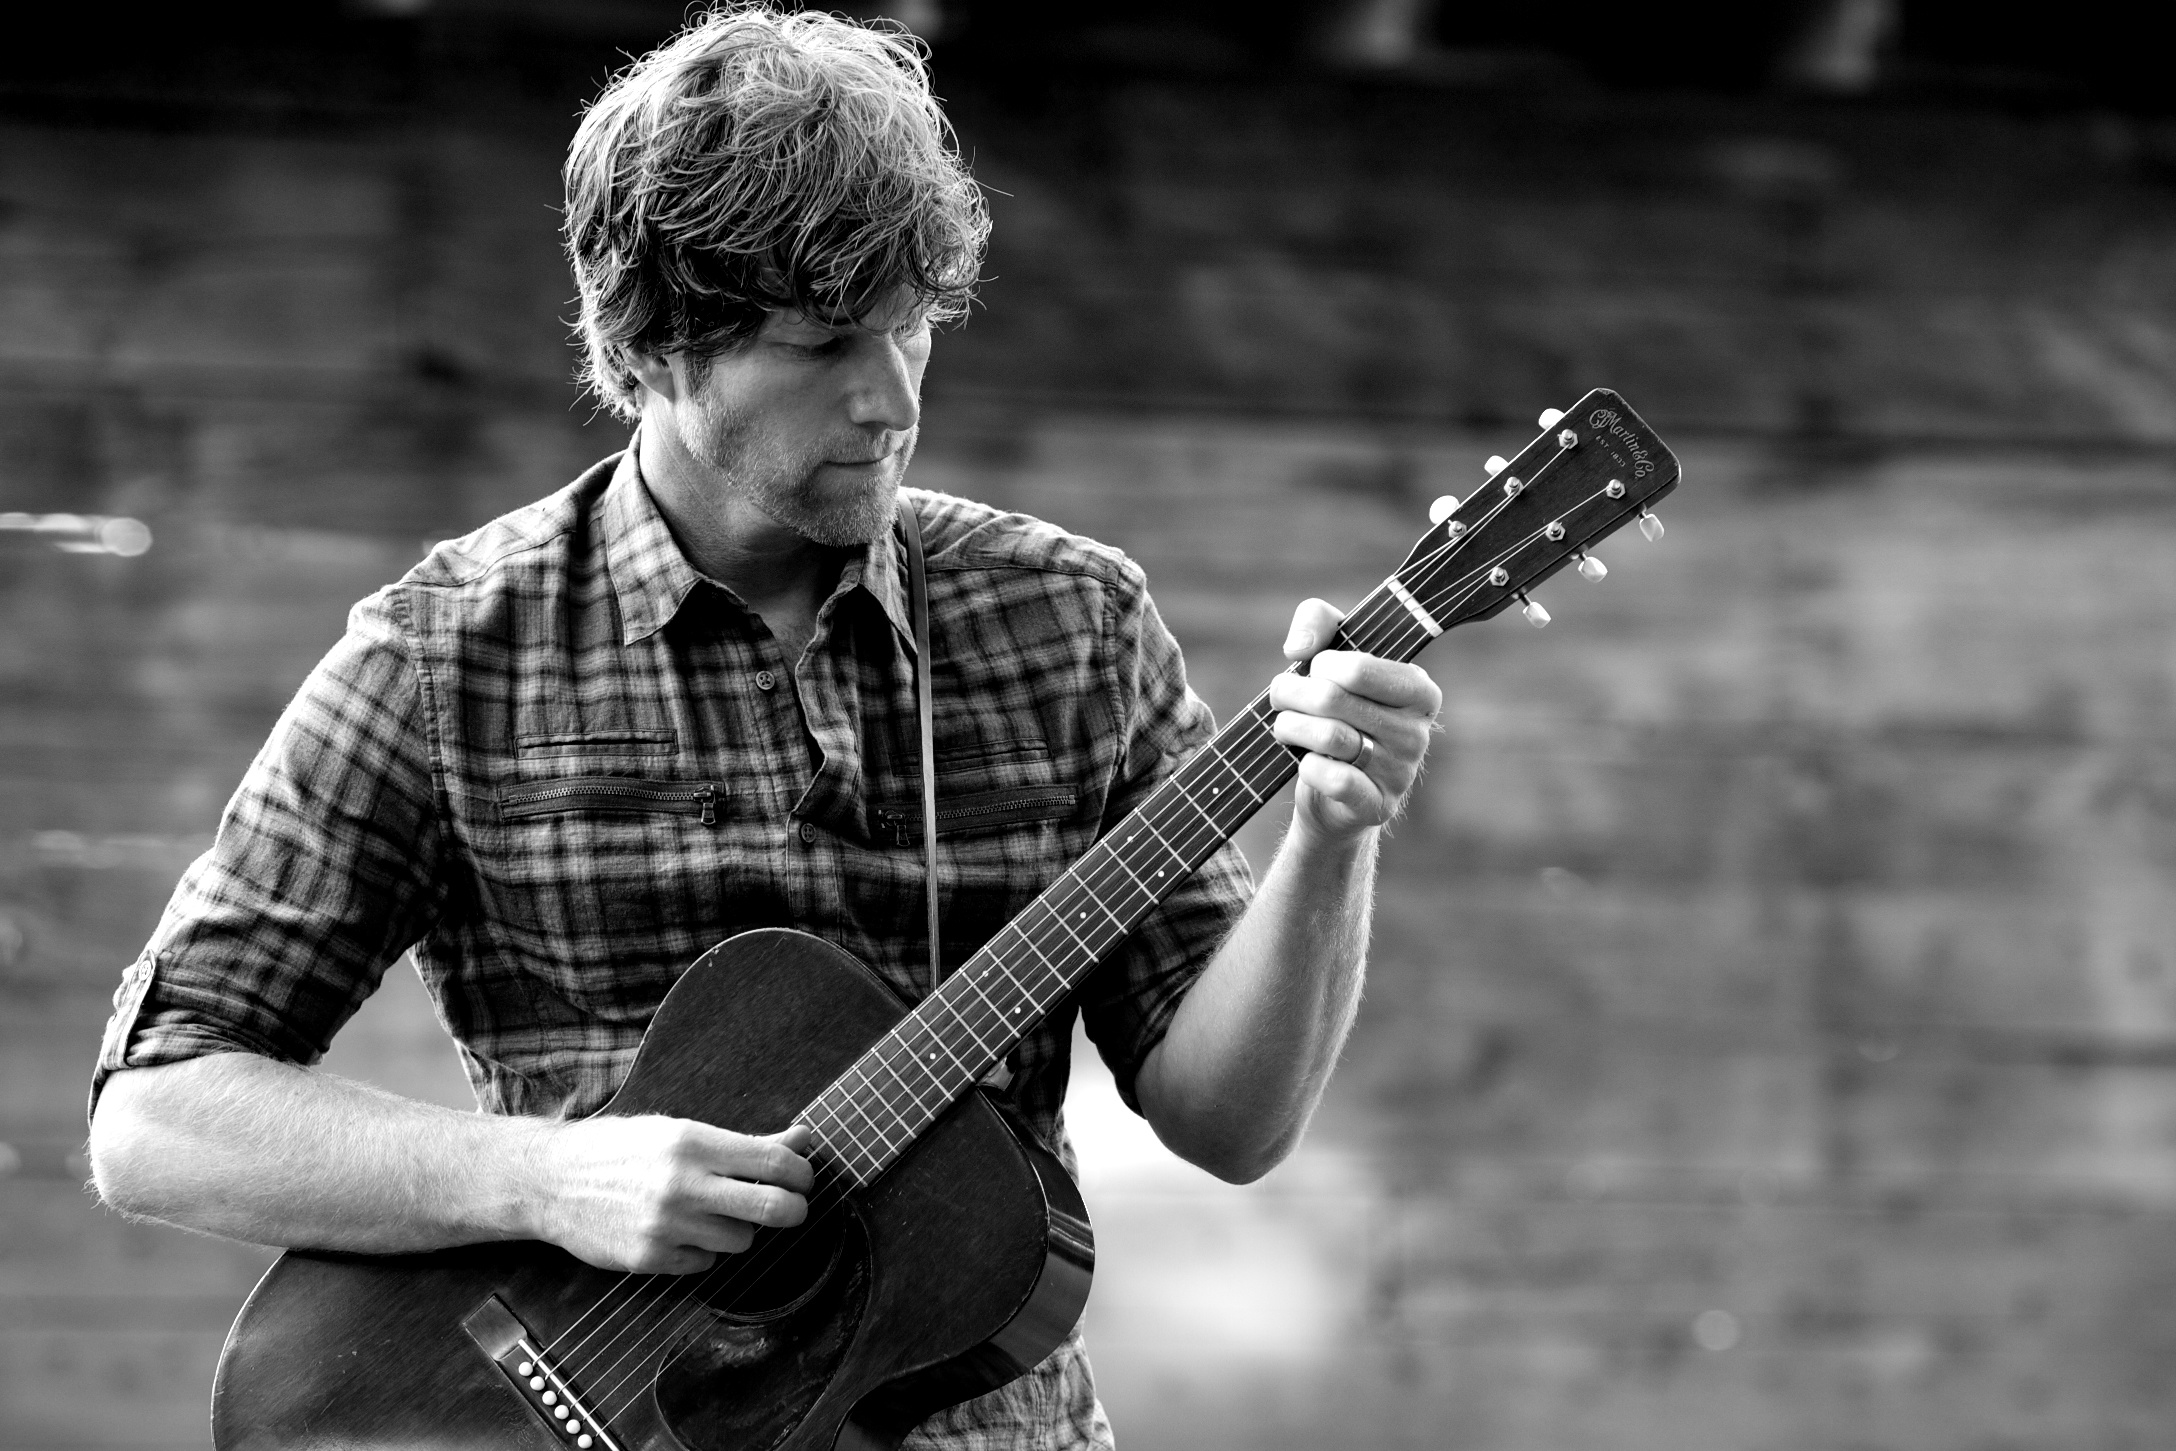 Alec_Guitar_5.png